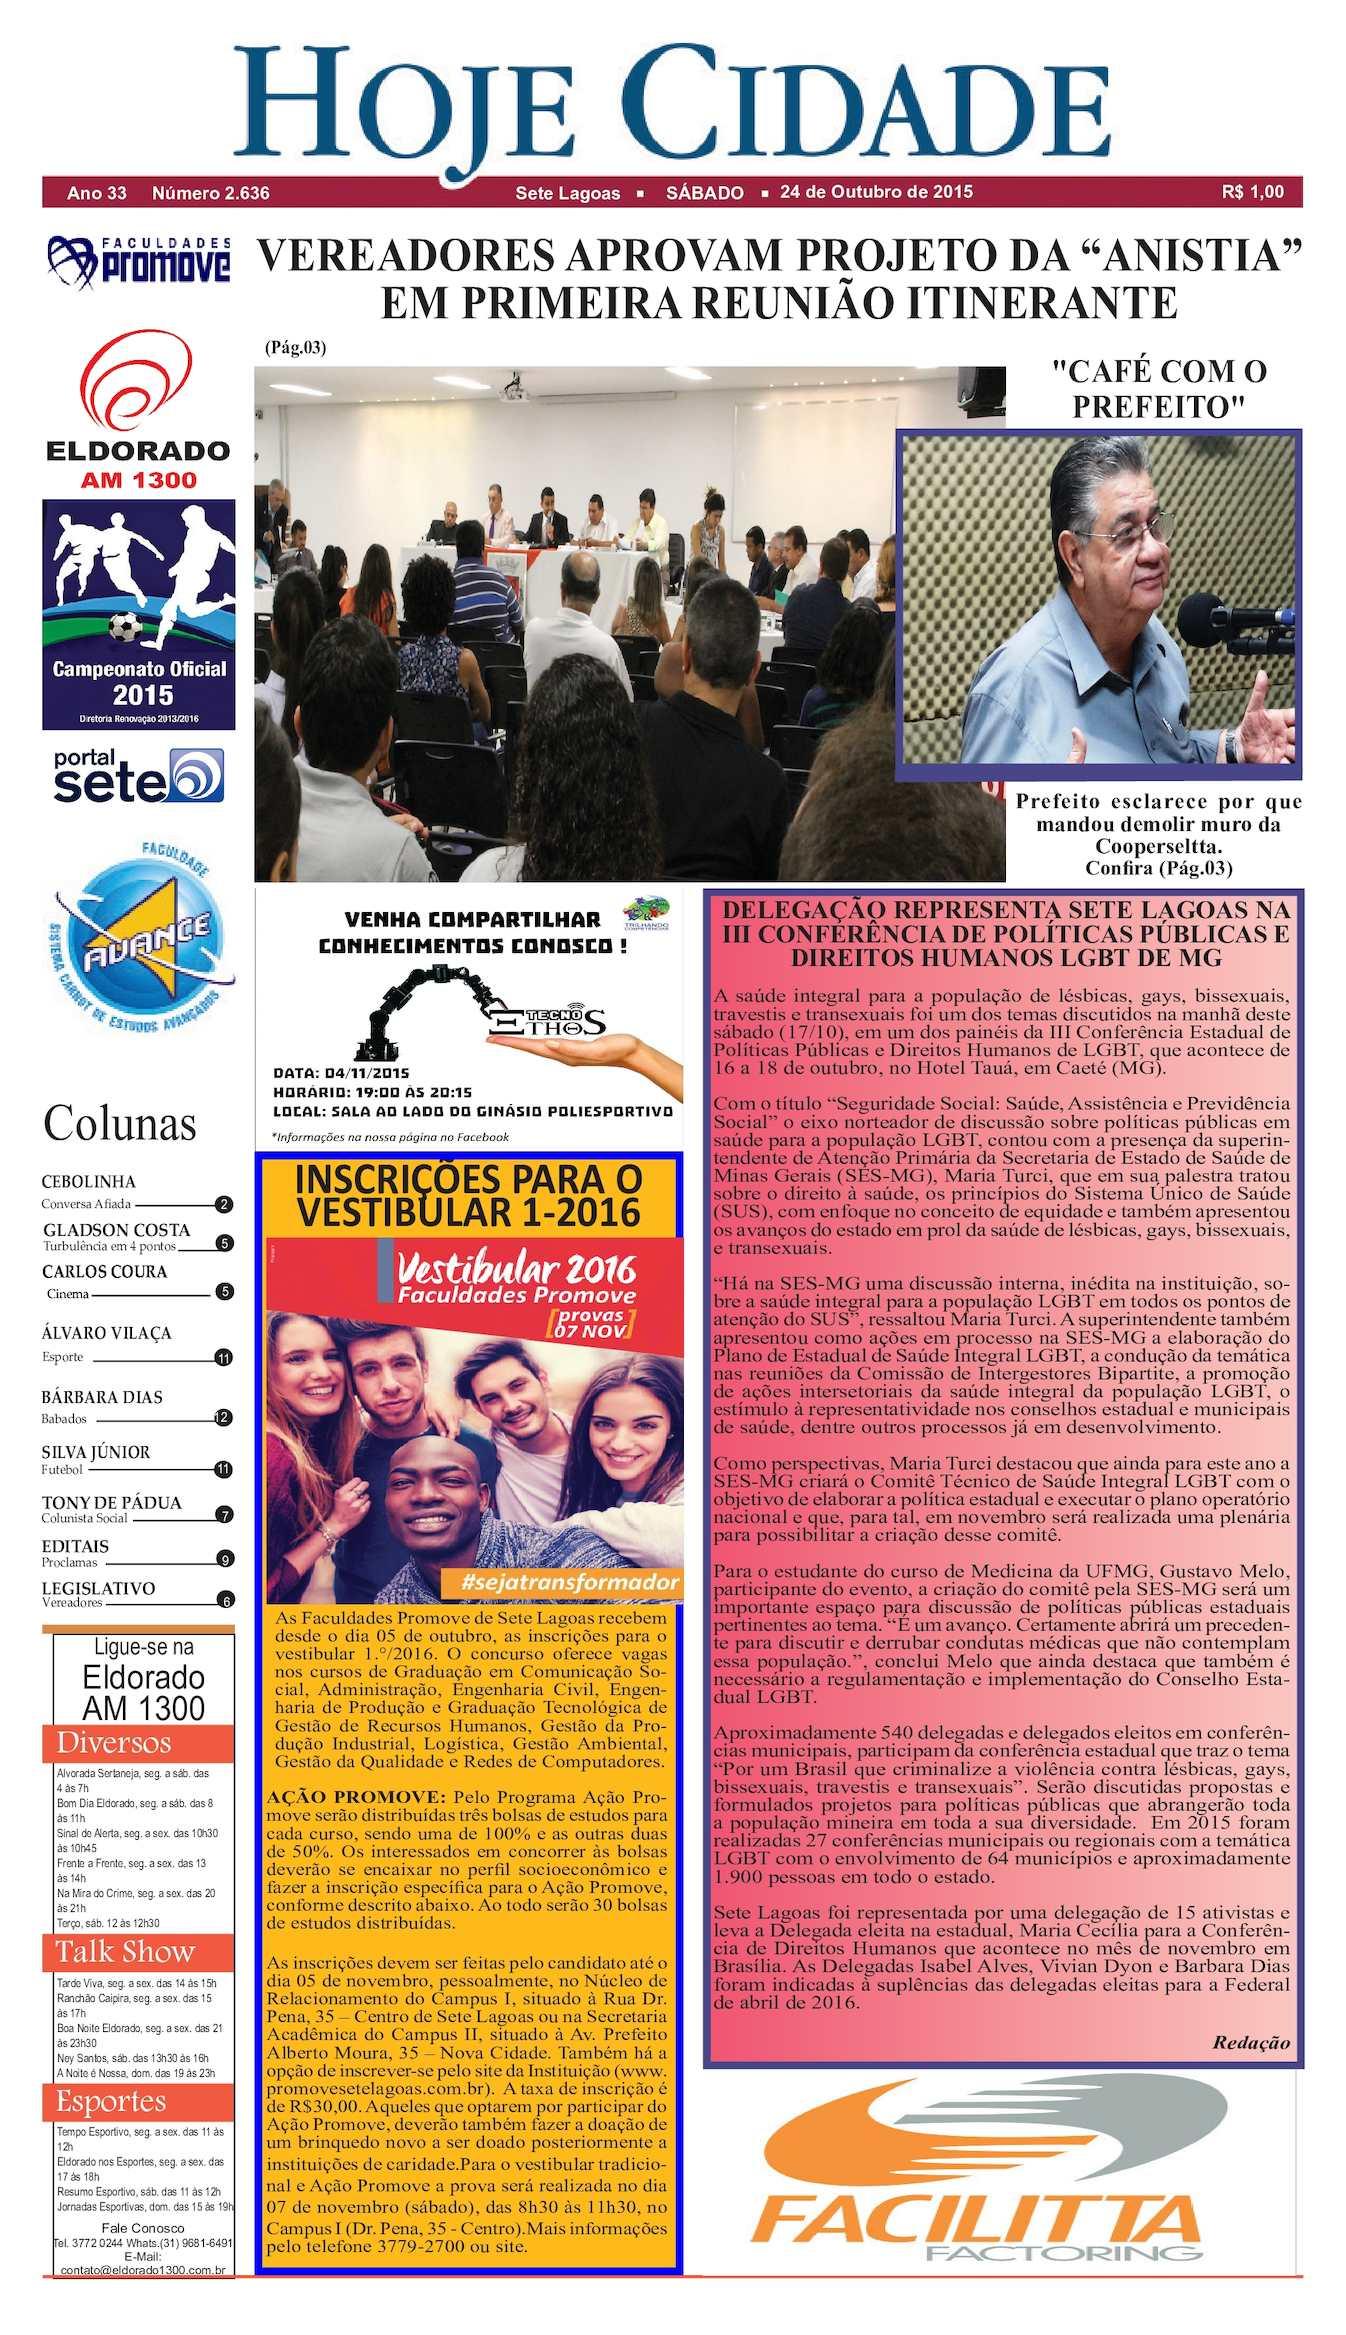 81223713bf Calaméo - Jornal Hoje Cidade 24 10 2015